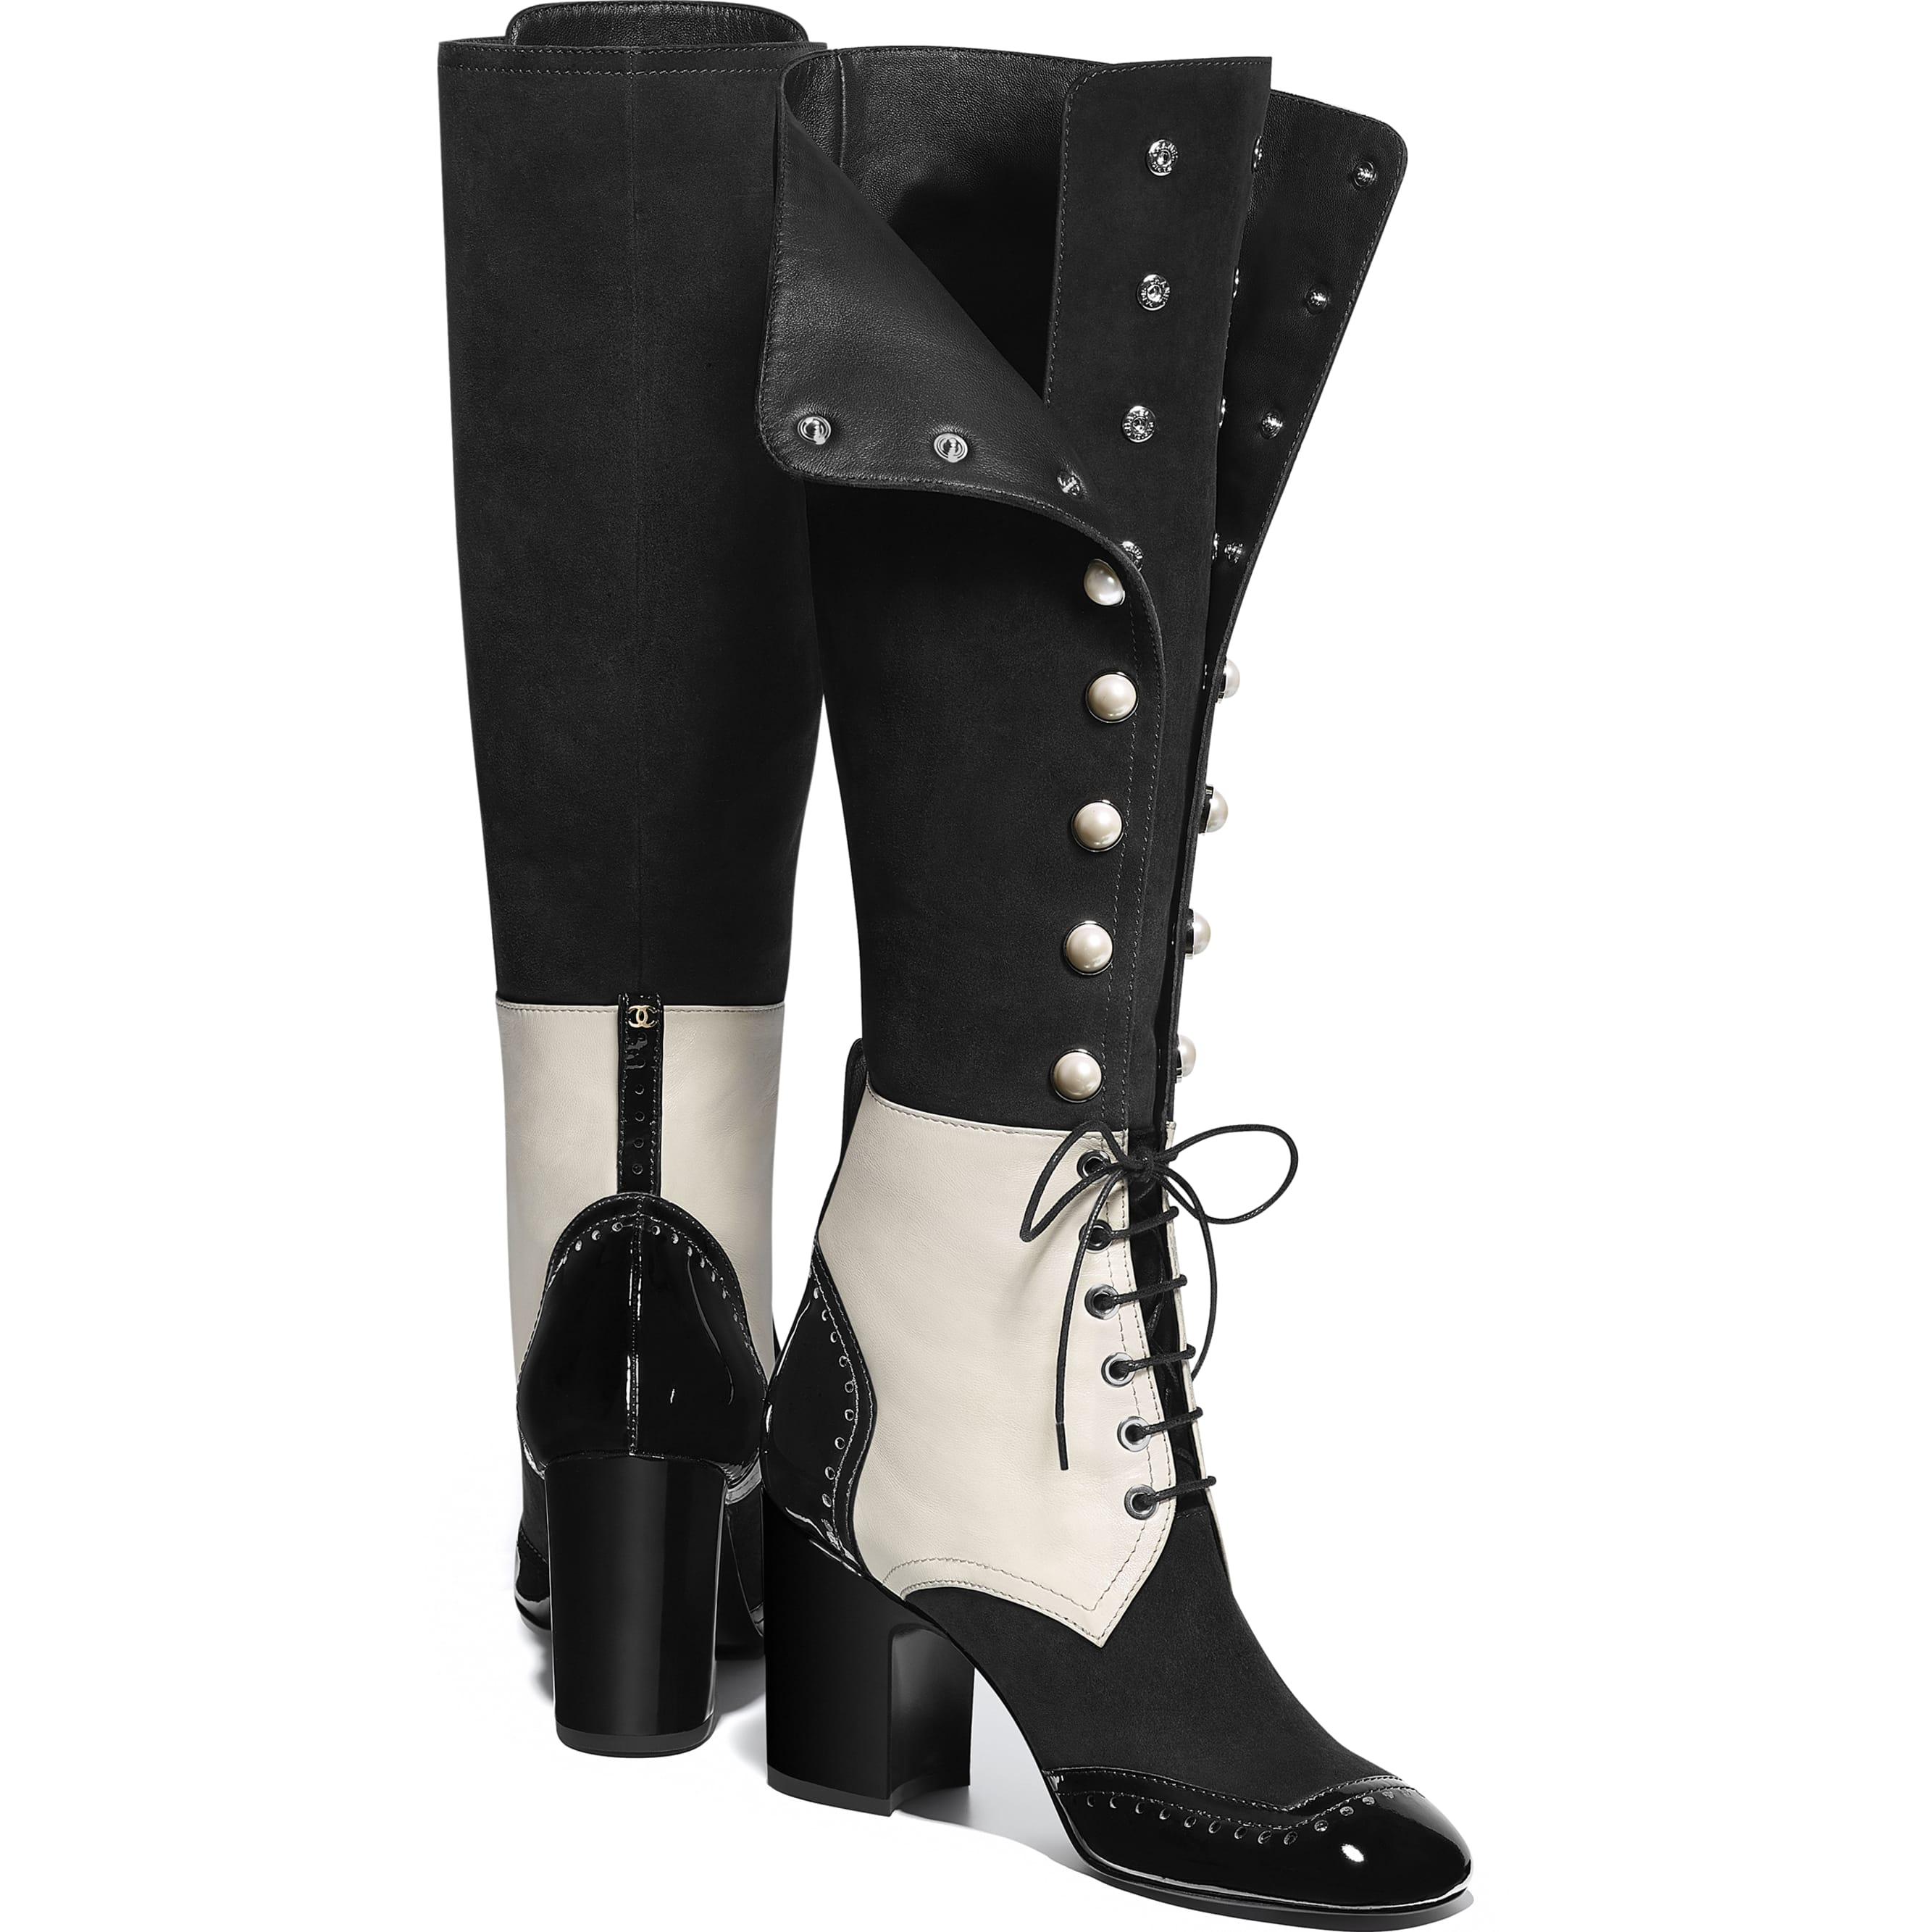 High Boots - Black & Ecru - Suede Goatskin, Lambskin & Patent Calfskin - Other view - see standard sized version